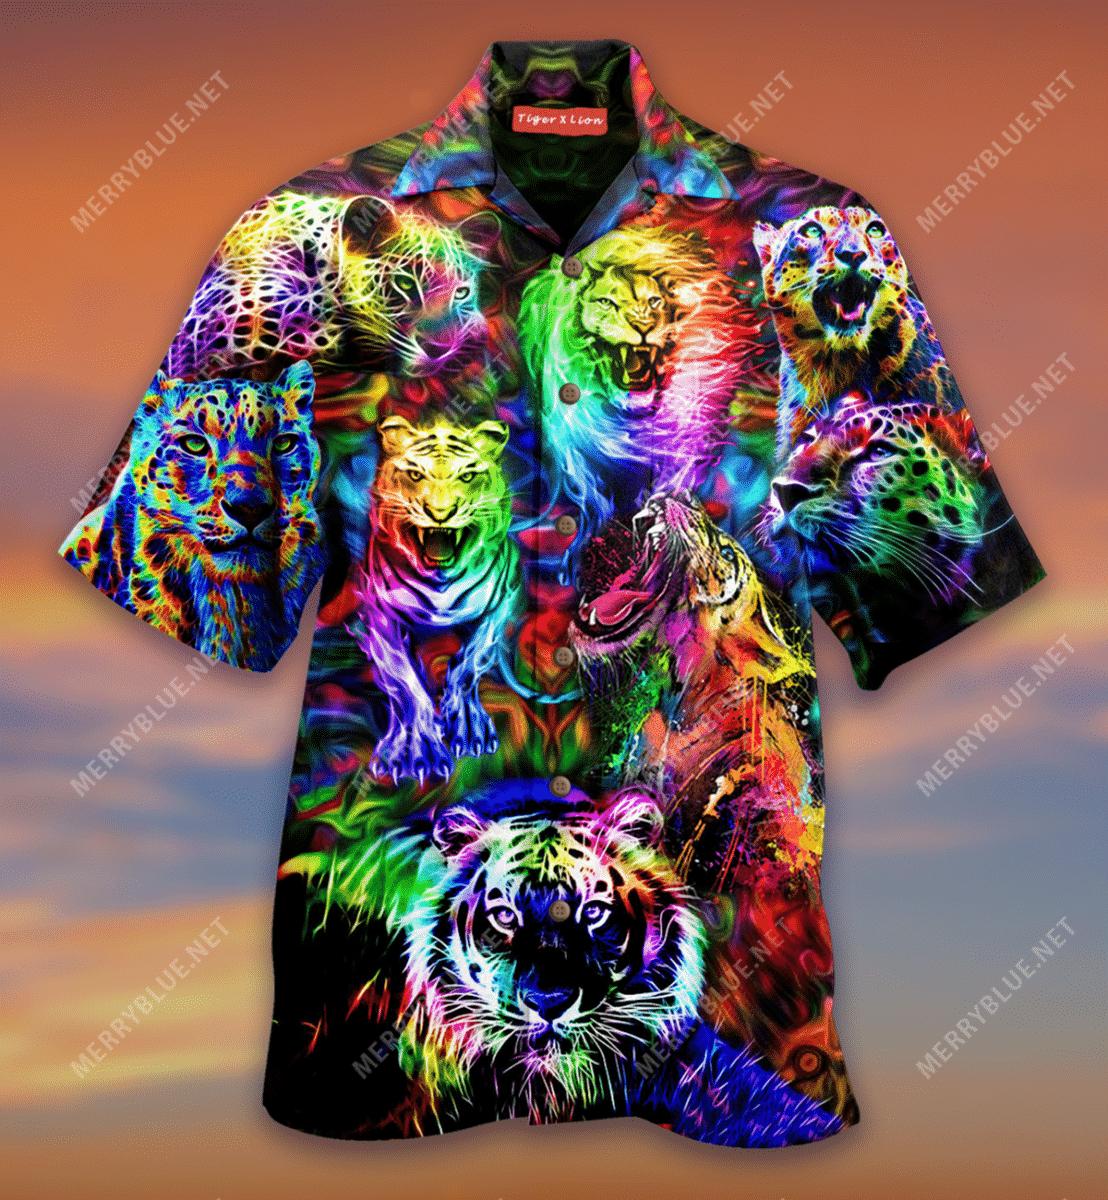 King of the Jungle Lion Tiger Leopard Colorful Hawaiian Shirt